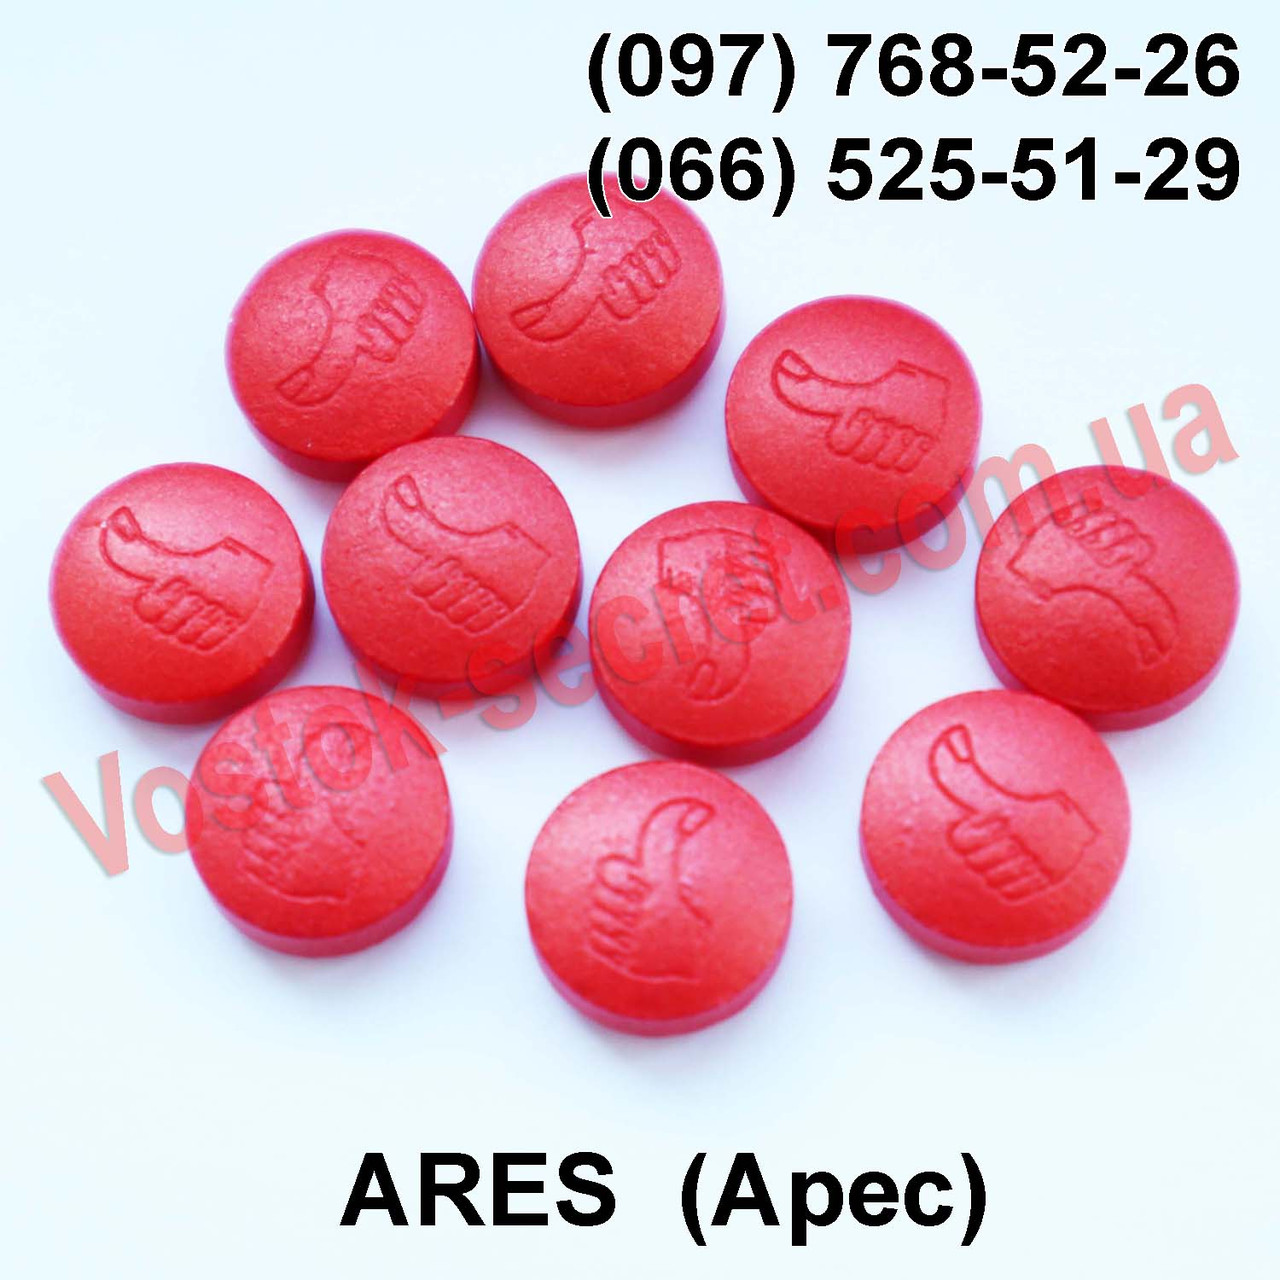 Арес ARES препарат для потенции. Пробник, 1 таблетка